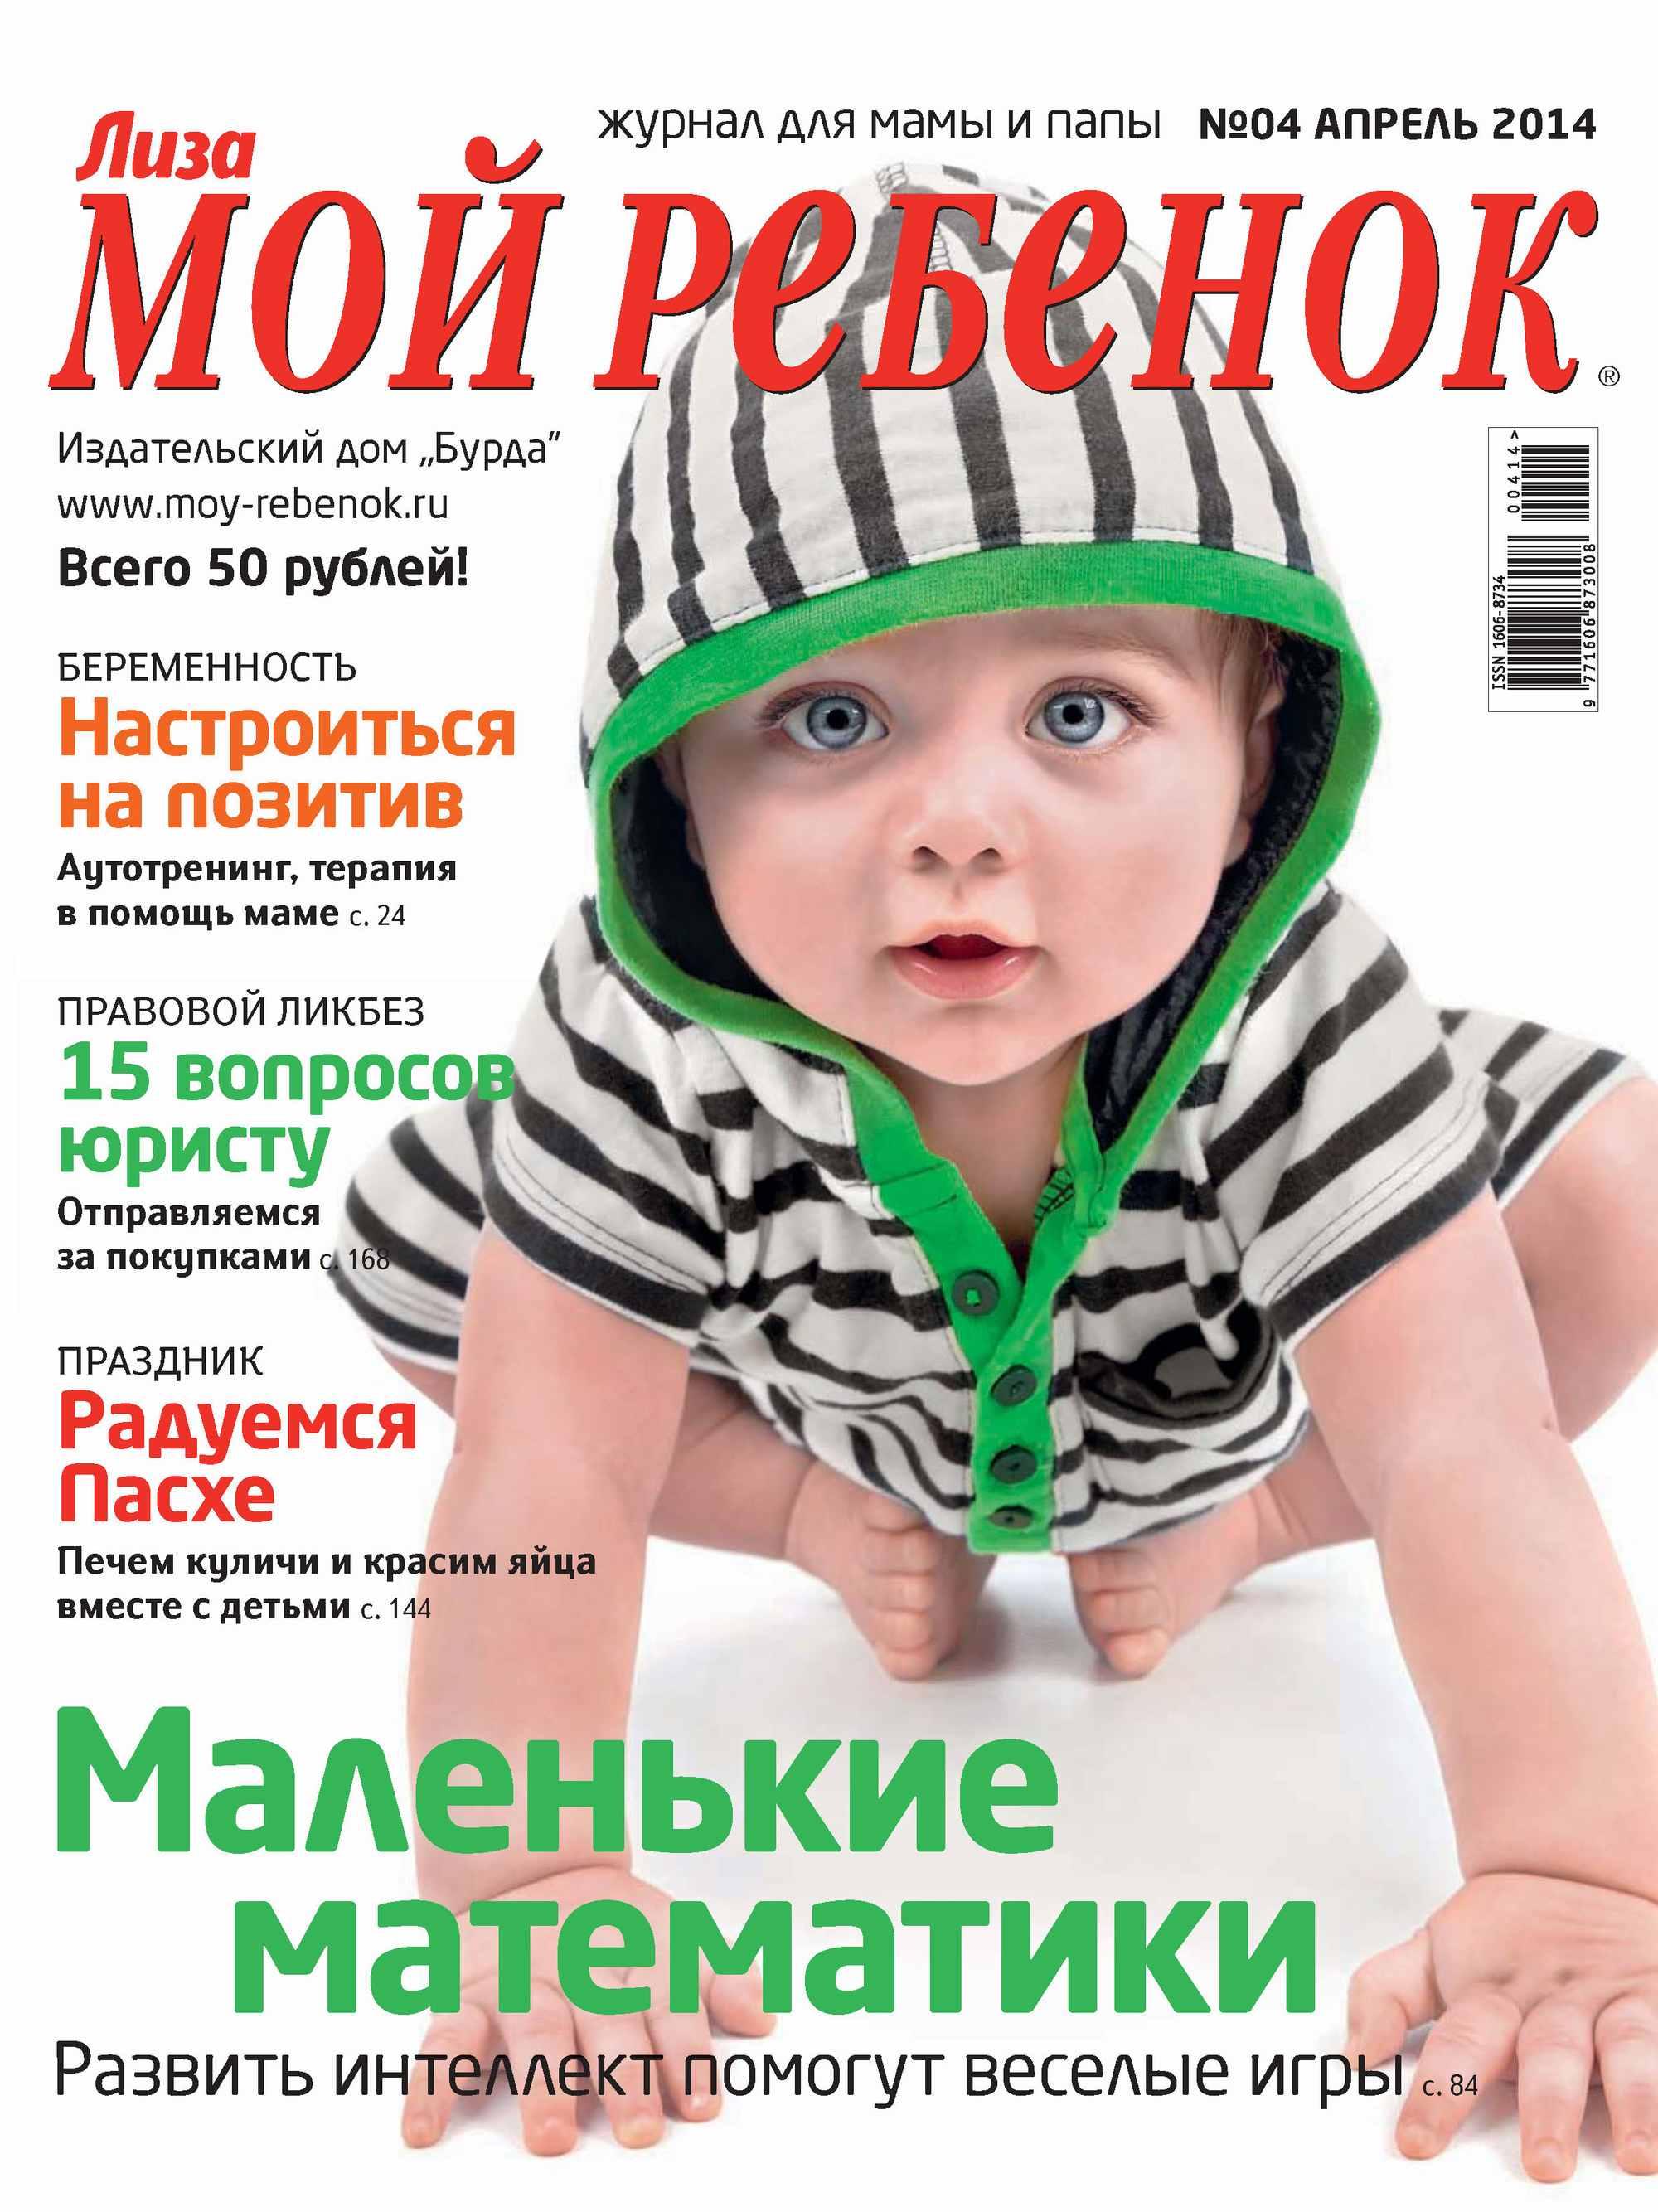 ИД «Бурда» Журнал «Лиза. Мой ребенок» №04/2014 ид бурда журнал лиза мой ребенок 11 2014